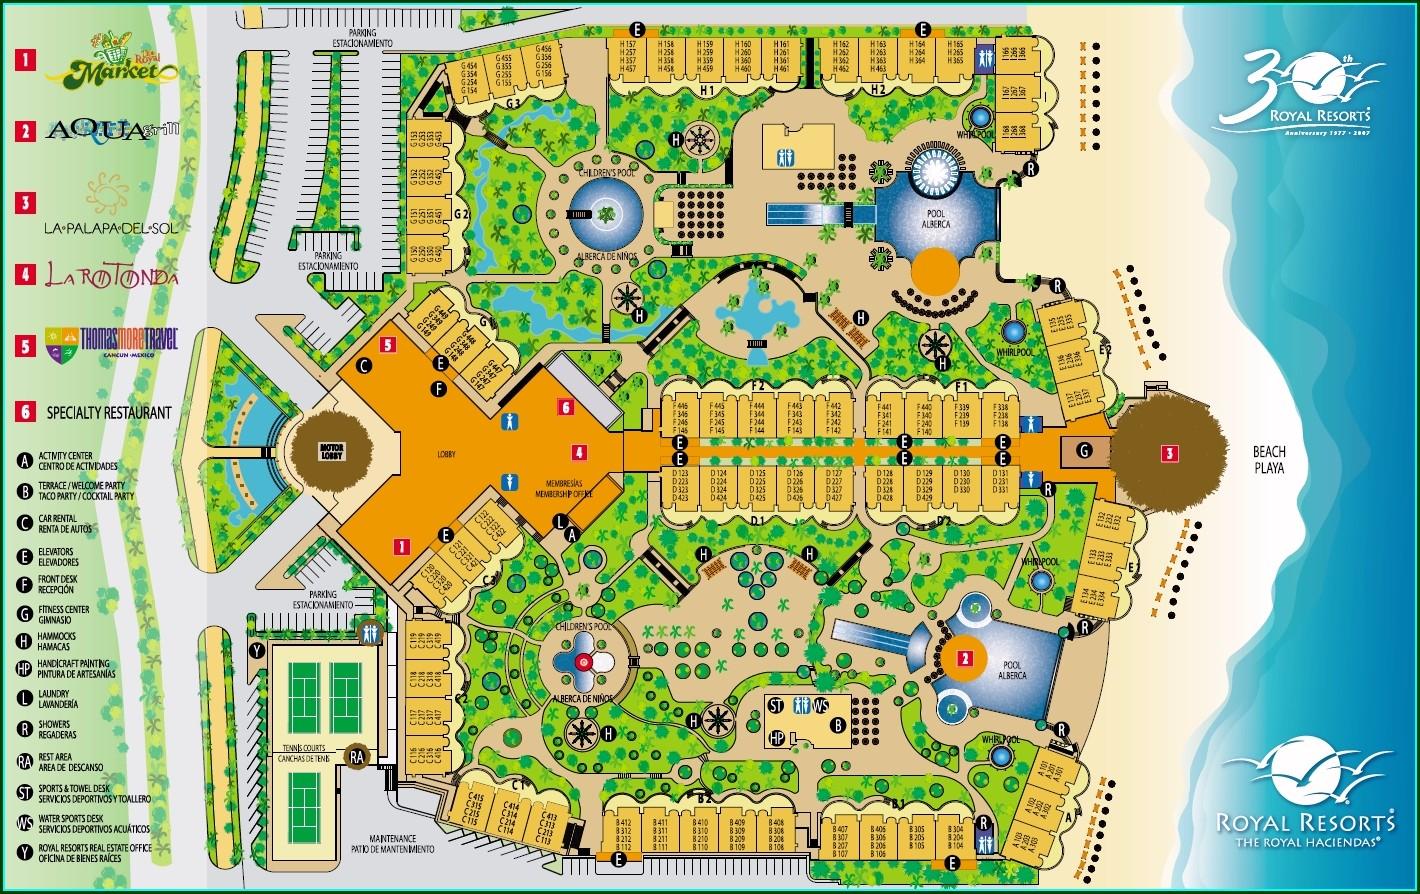 Royal Haciendas Room Map